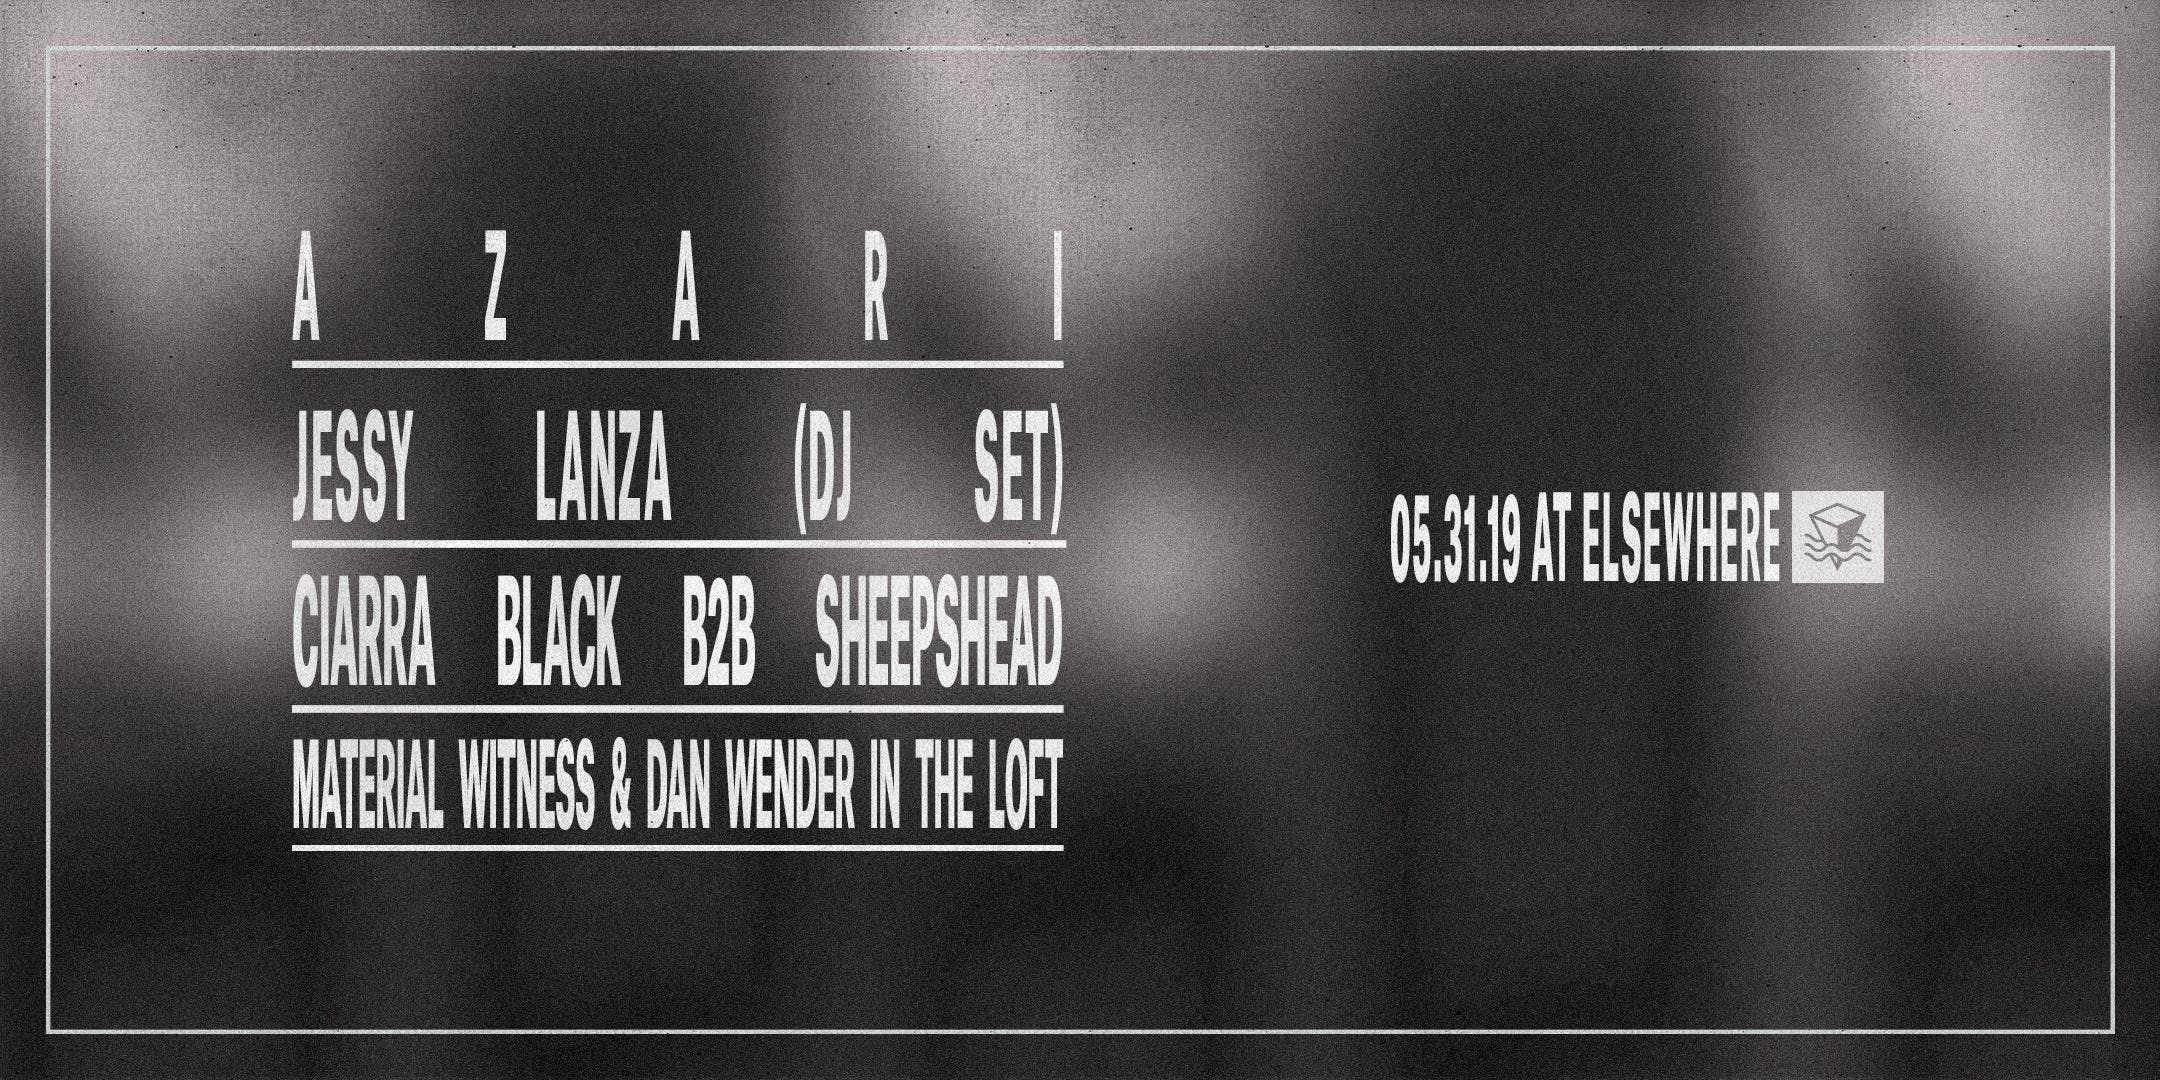 Azari, Jessy Lanza (DJ Set), Ciarra Black B2B Sheepshead, Material Witness & Dan Wender